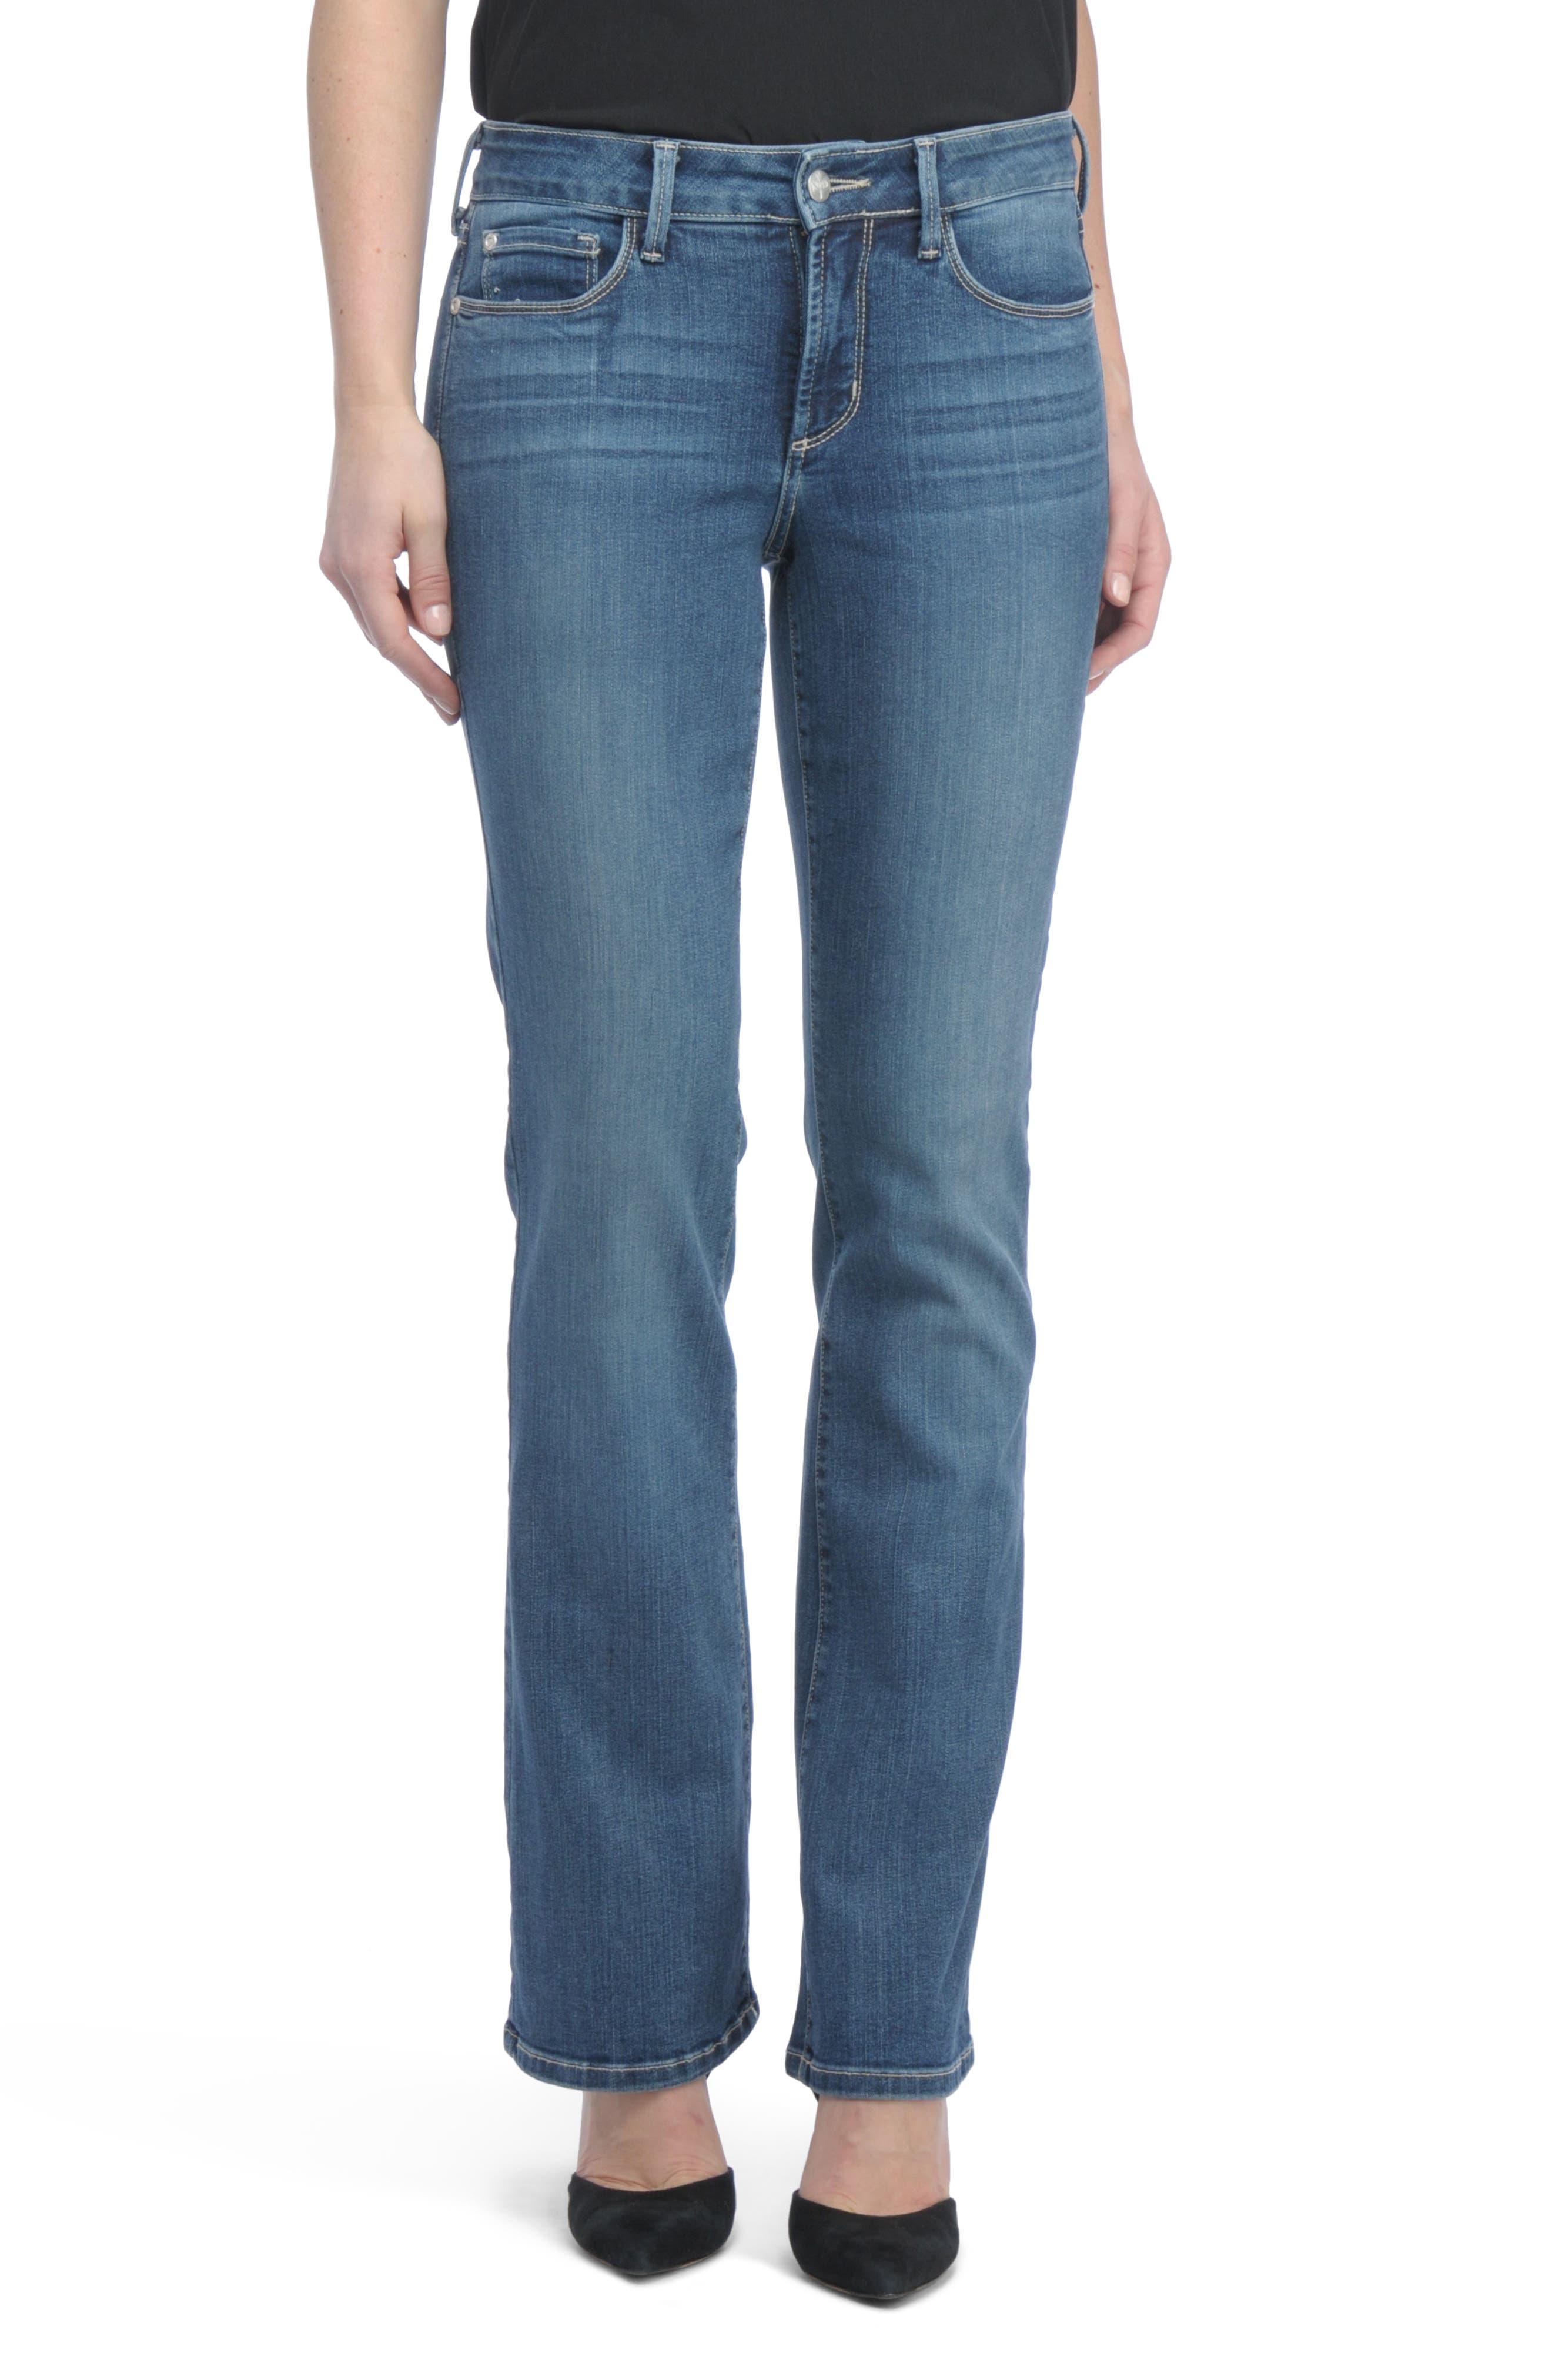 Barbara Bootcut Short Jeans,                         Main,                         color, 421